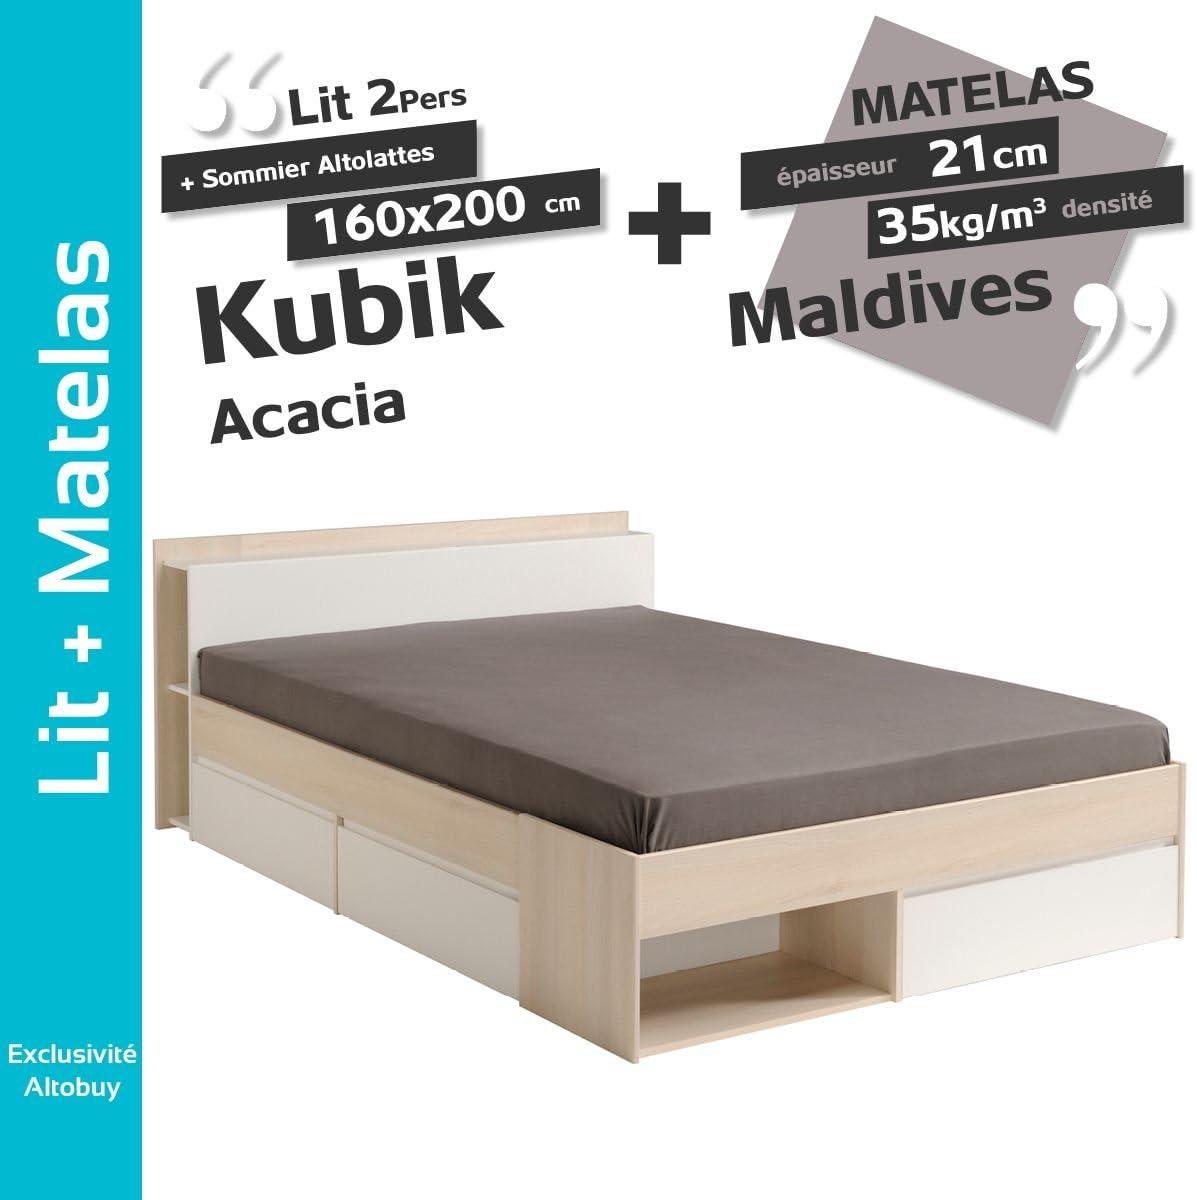 Kubik Acacia – Pack Cama 160 x 200 cm + somier altolattes + ...